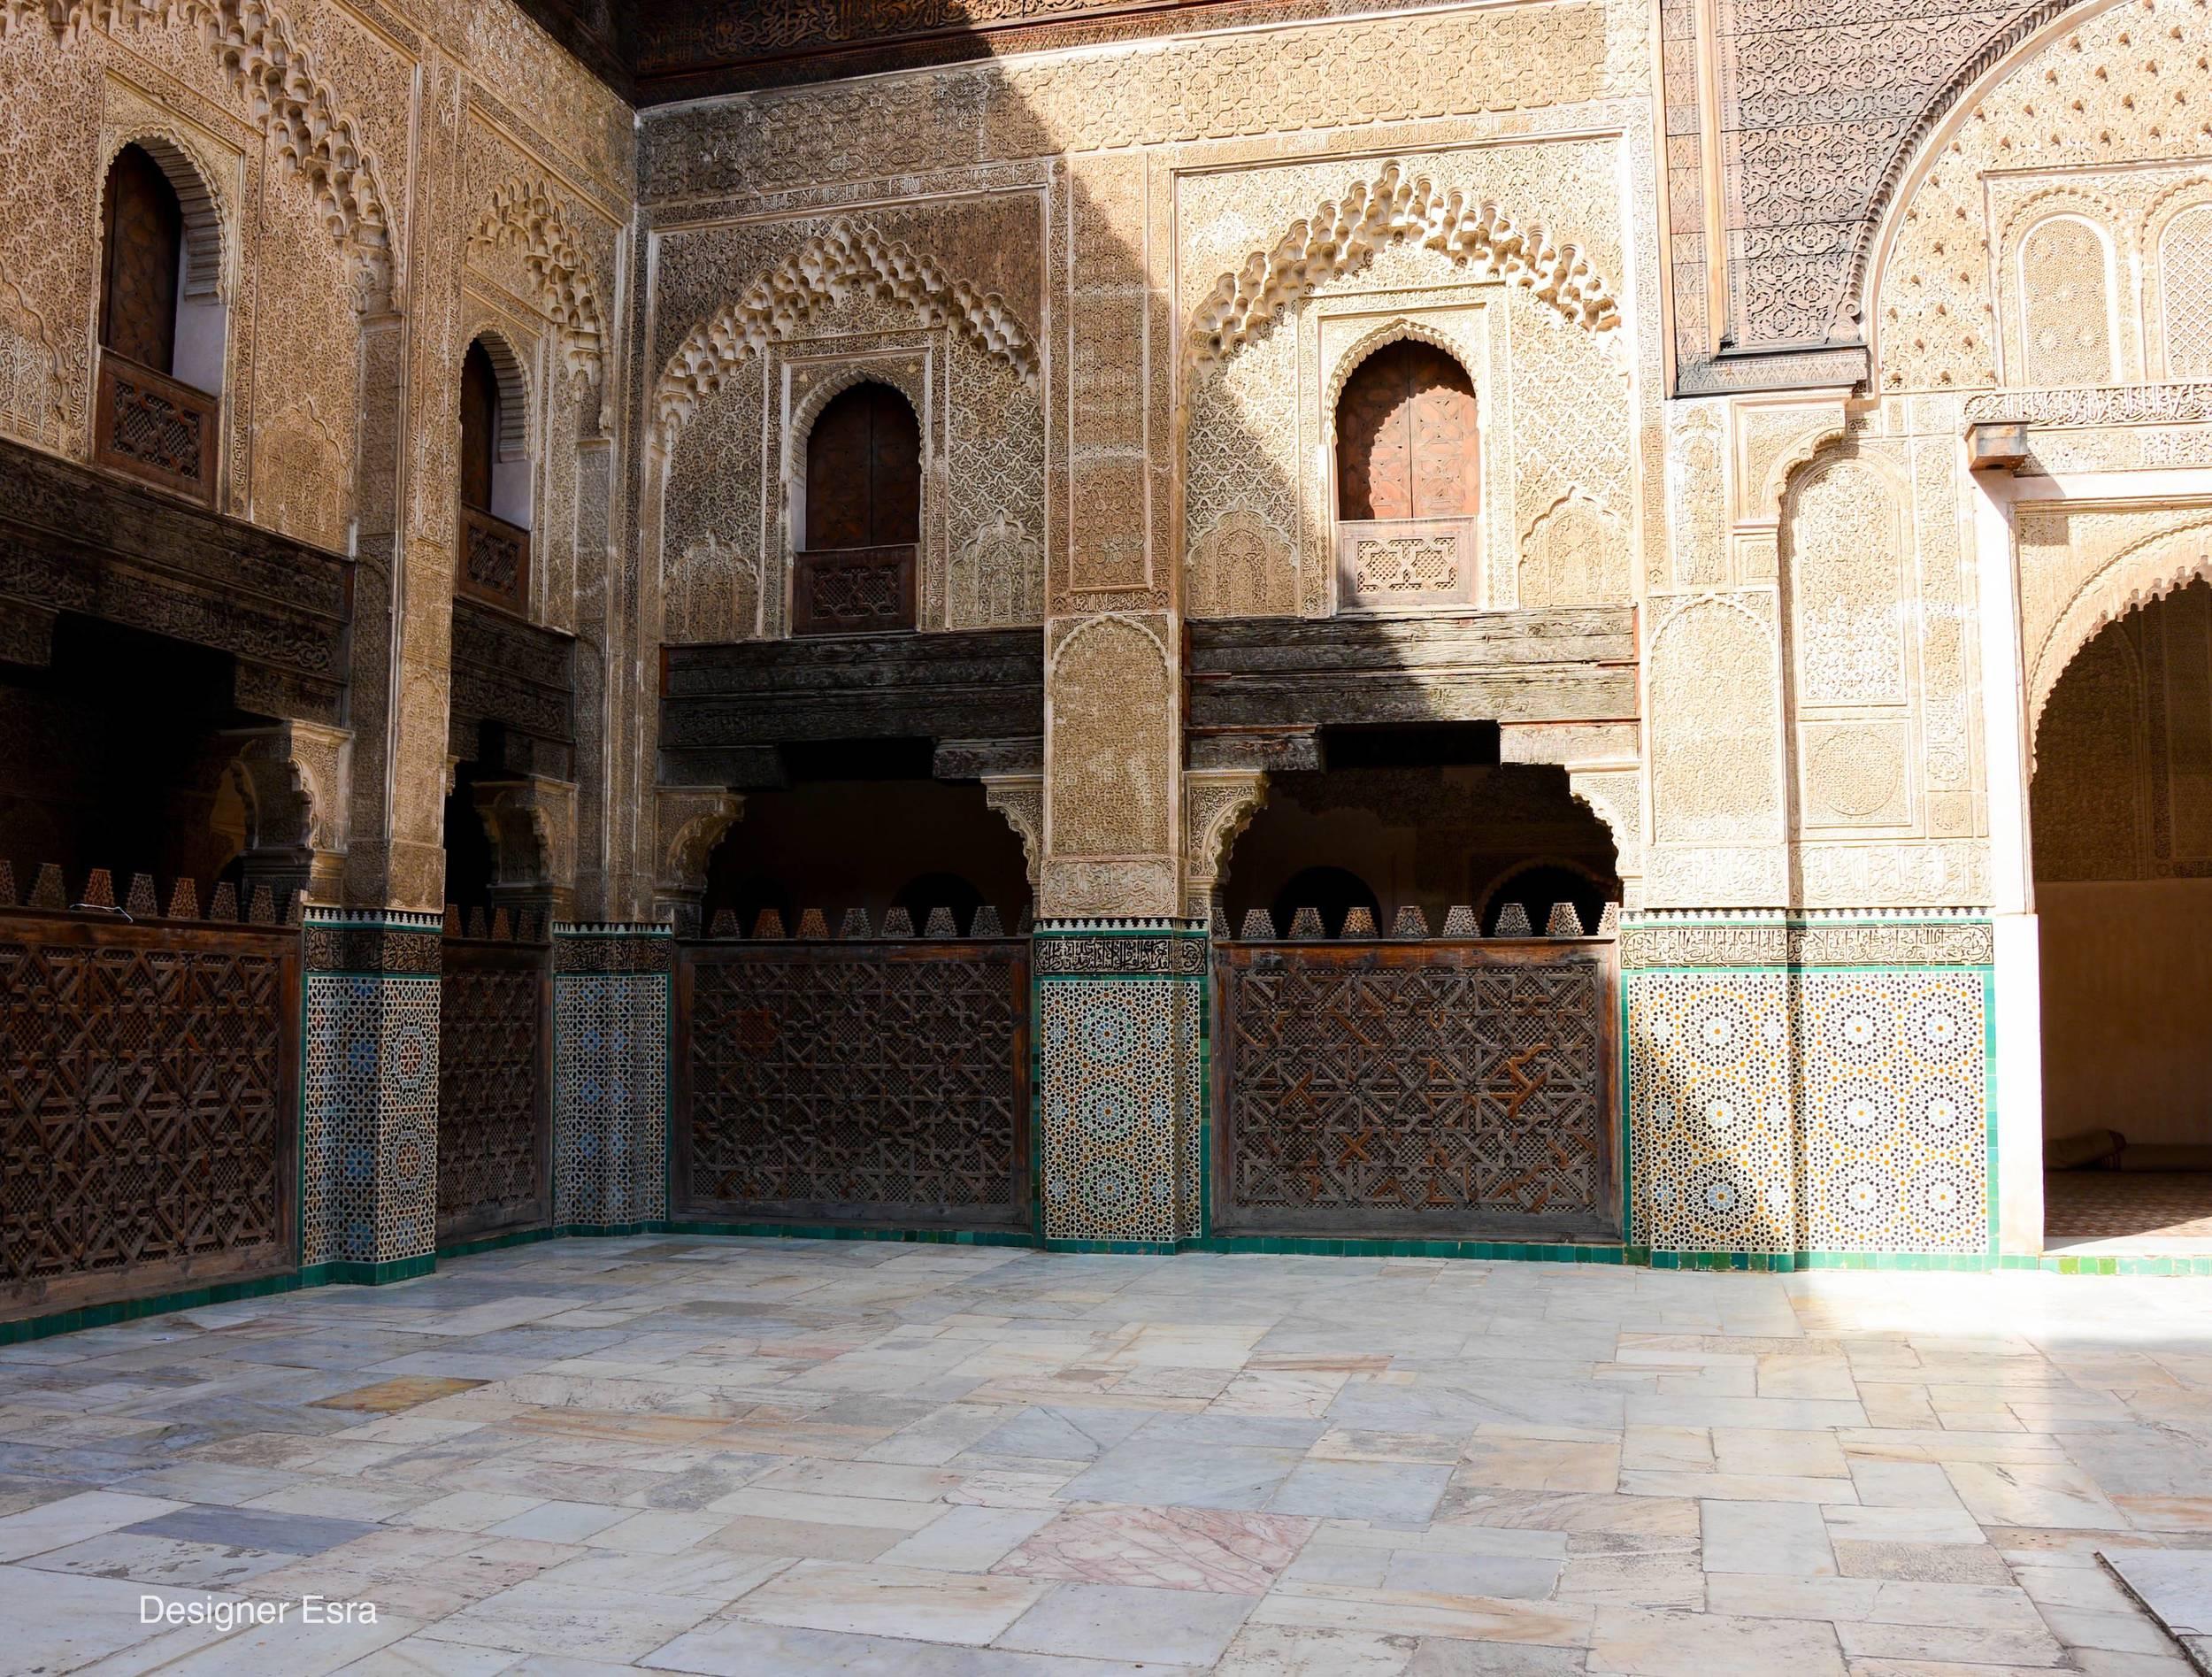 Bou Inania Madrasa in Fes, Morocco